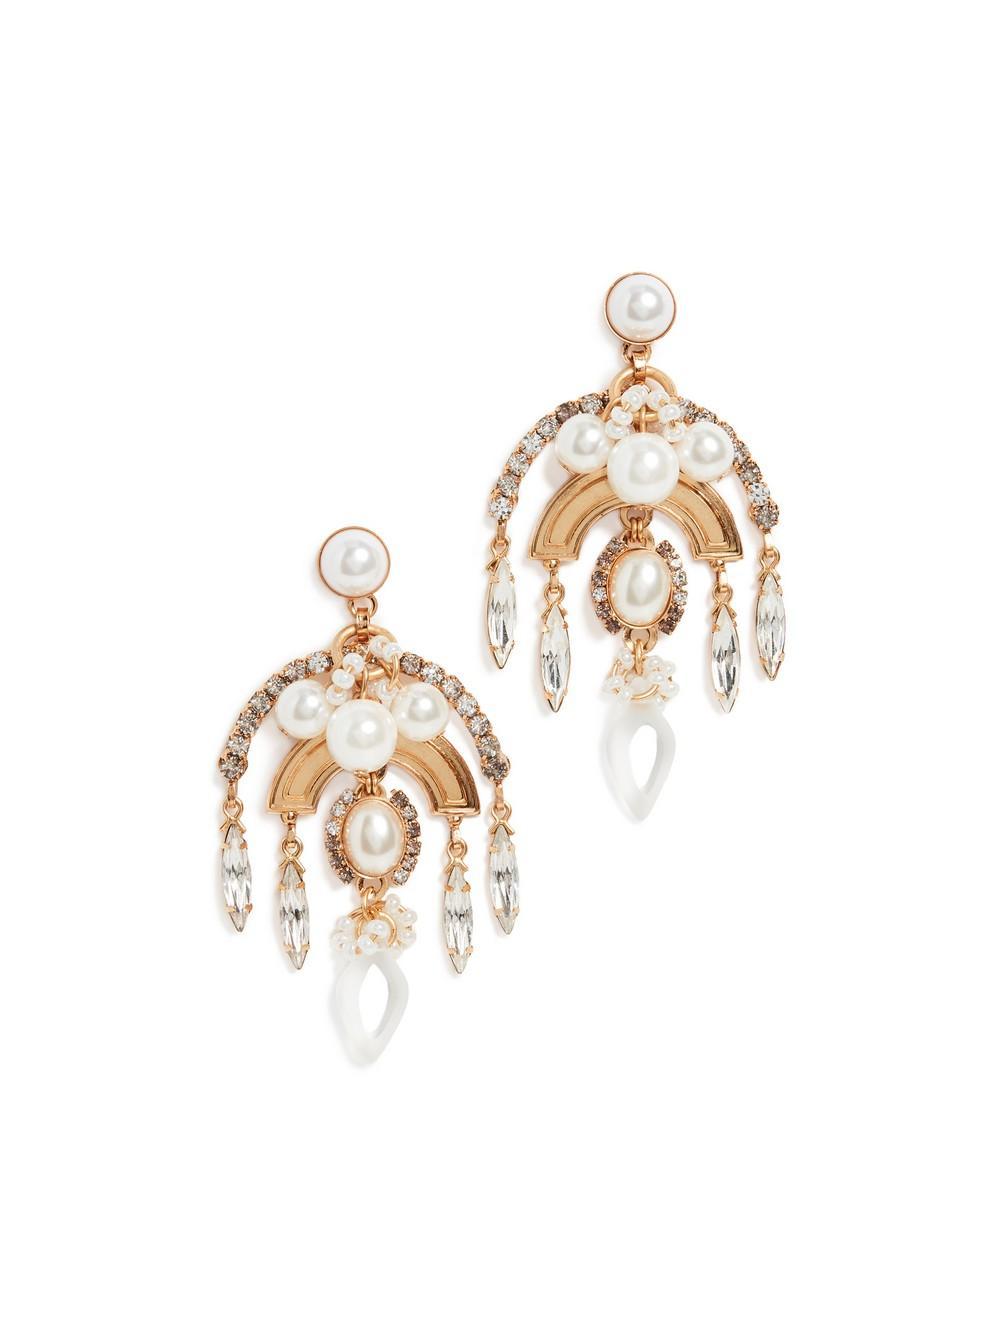 Danna Earrings Item # PF20E6-PRL-C